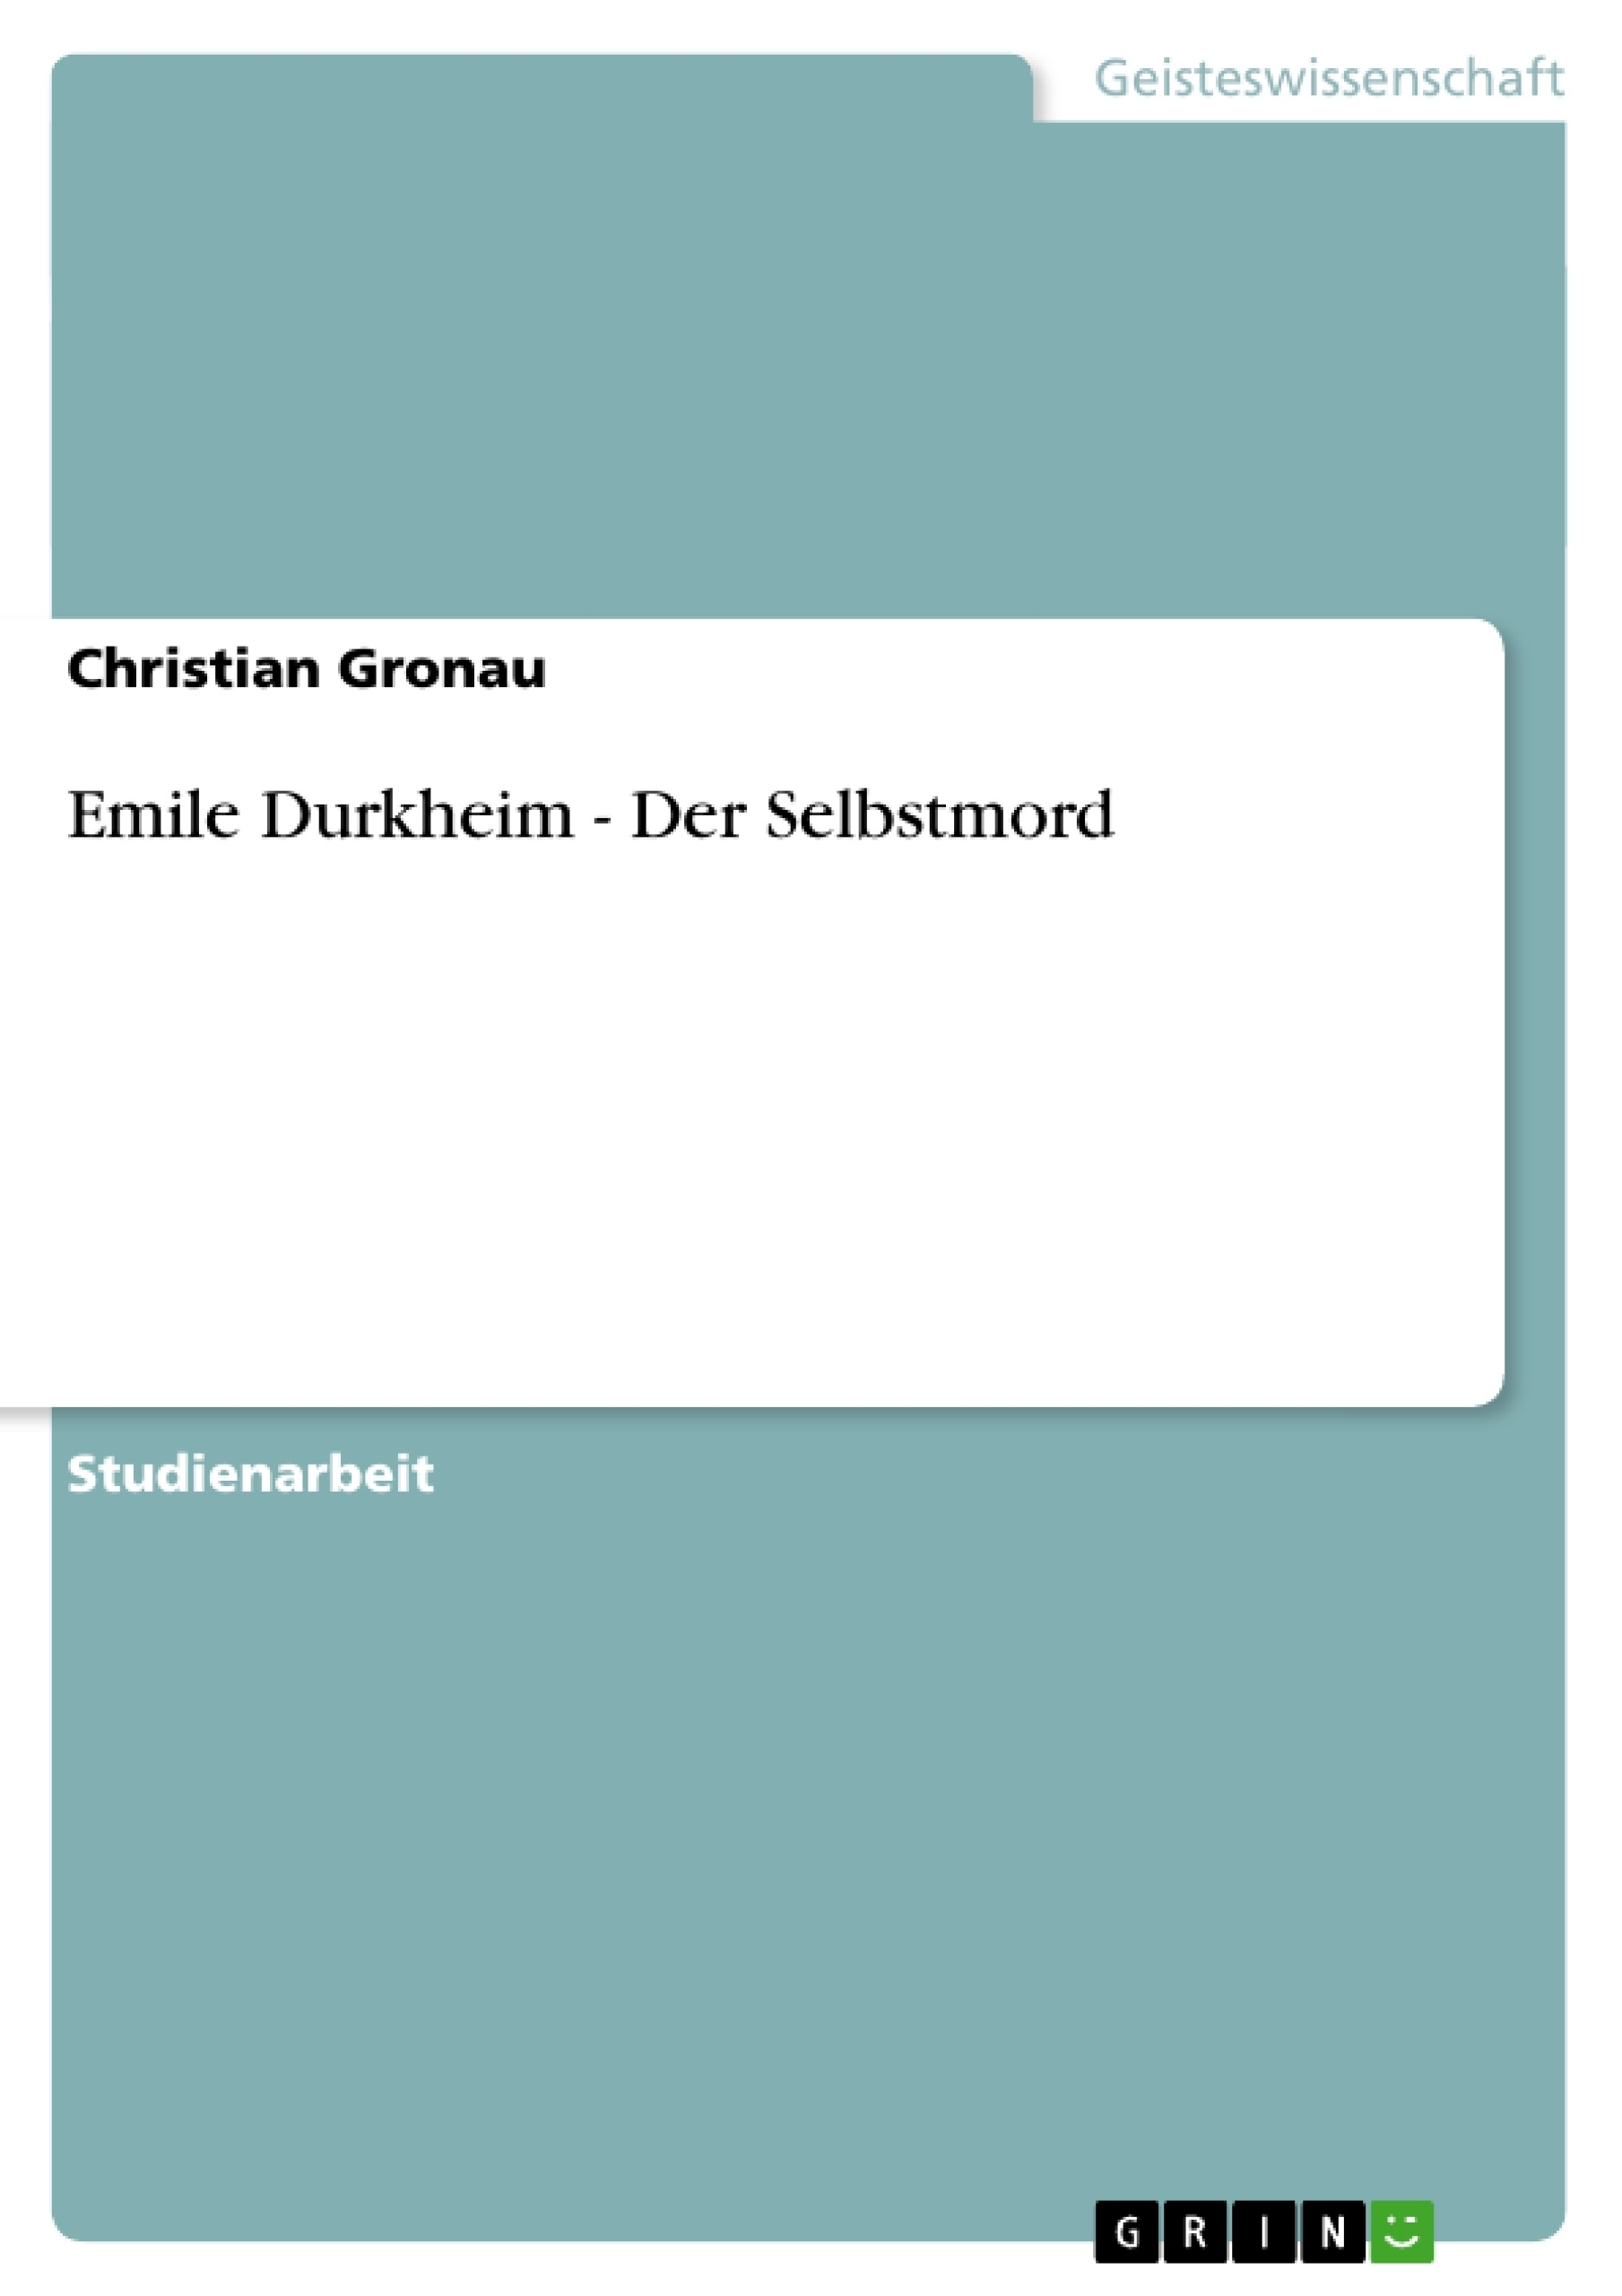 Titel: Emile Durkheim - Der Selbstmord